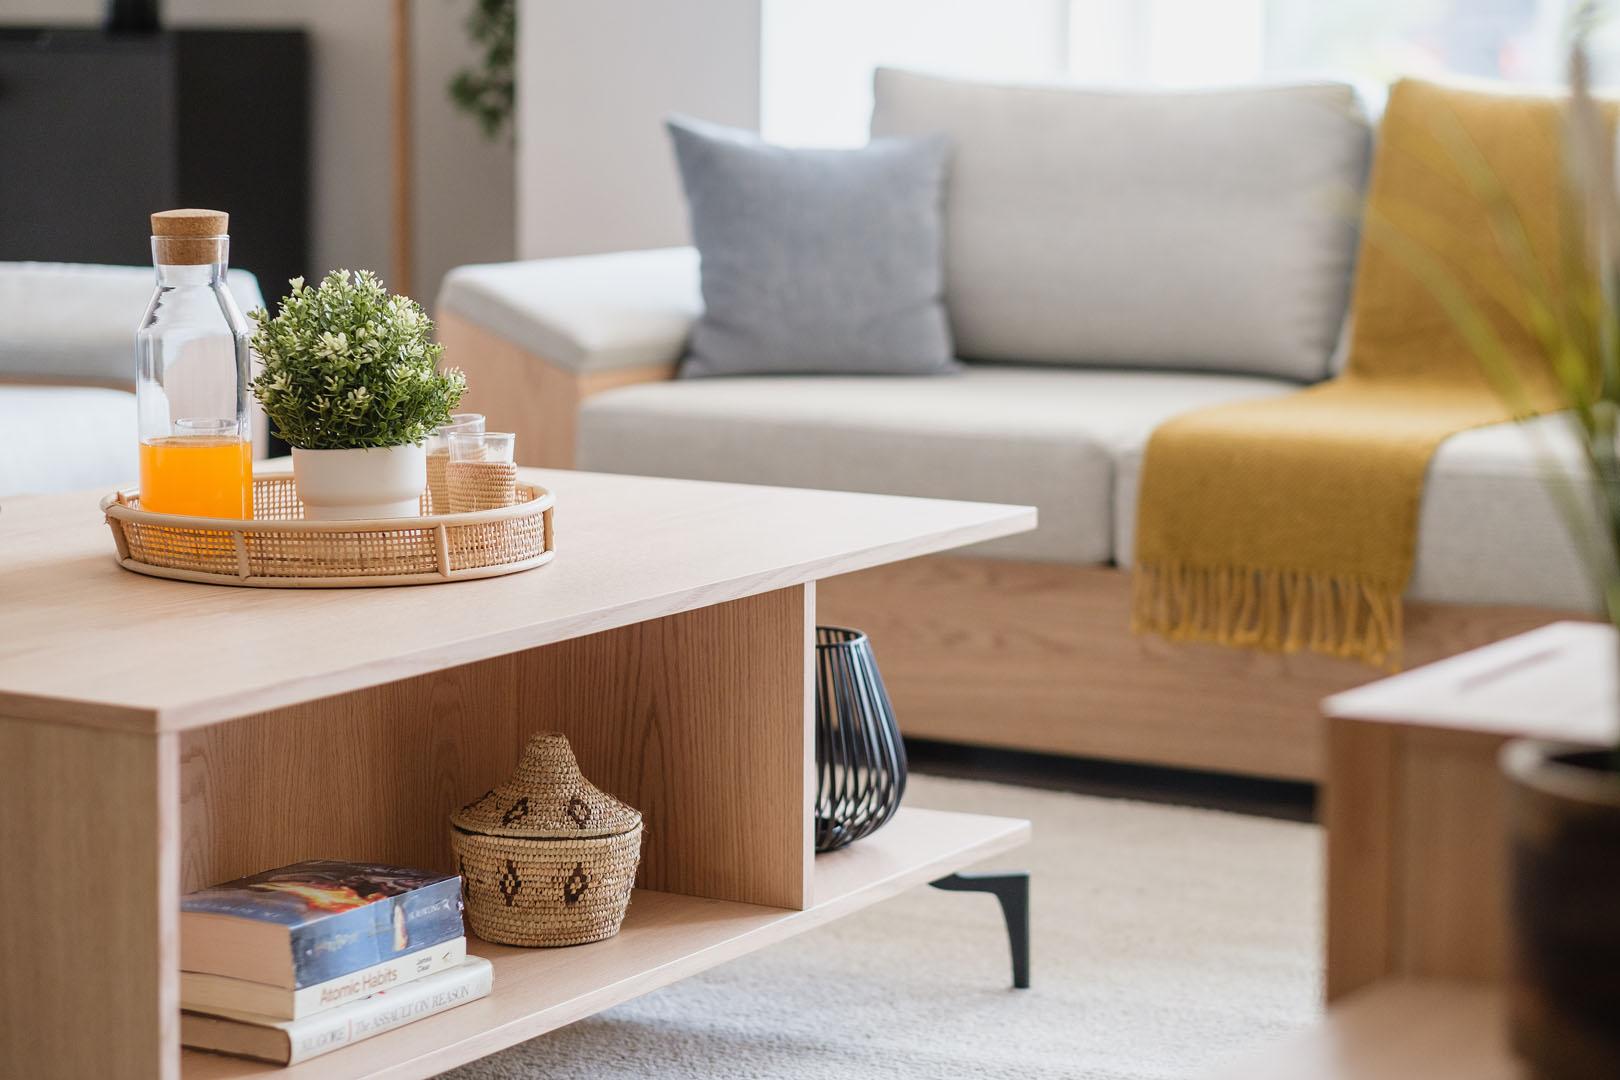 Kilim living - Pinocchio furniture